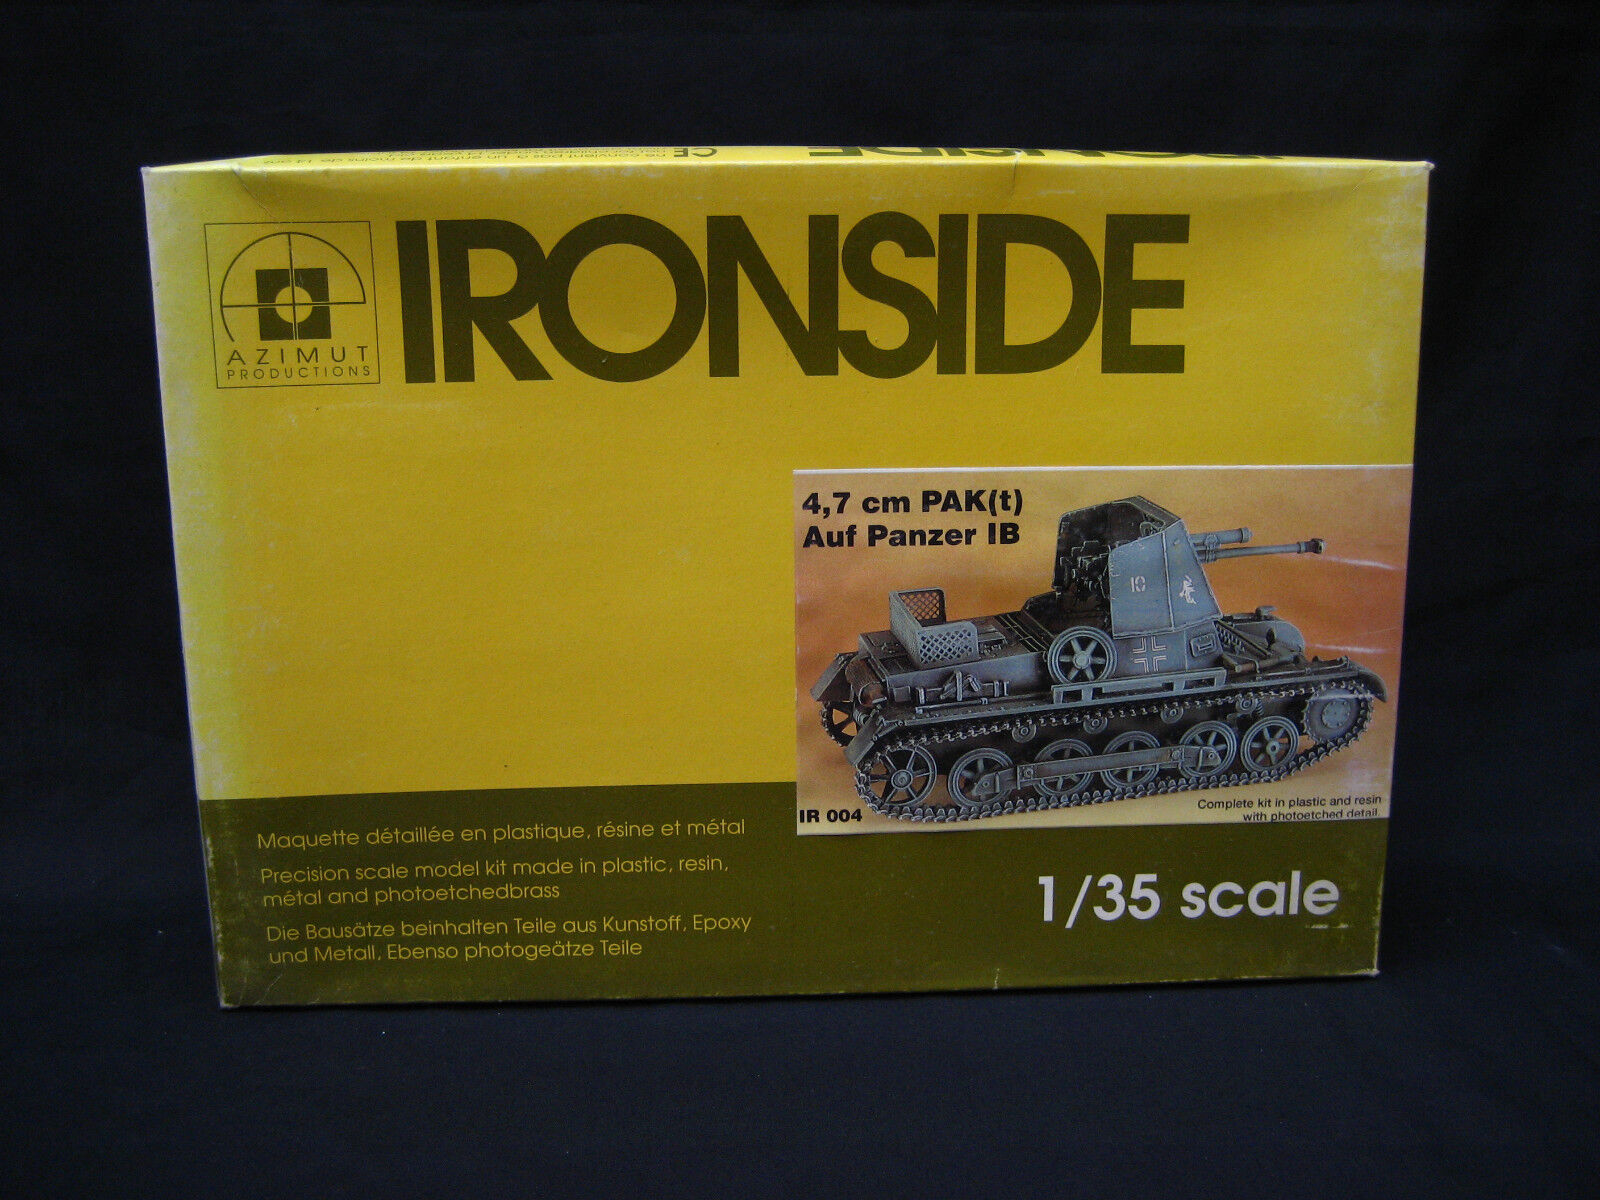 AZIMUT- IRONSIDE 1 35 SCALE 4,7 CM PAK(T) Auf Panzer IB MODEL KIT PLASTIC+RESIN